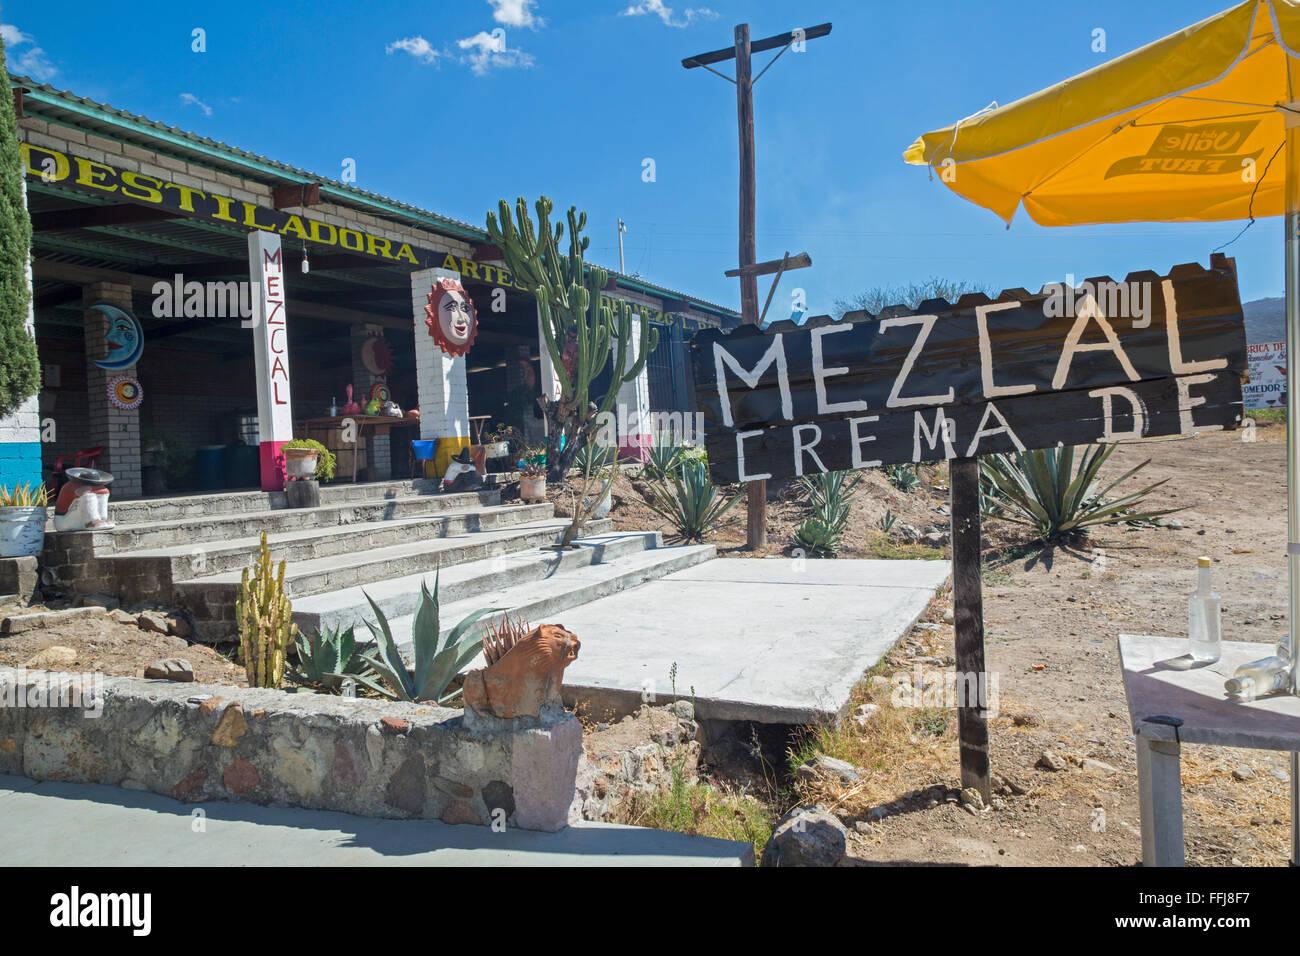 Santiago Matatlán, Oaxaca, México - una destilería de Mezcal. Foto de stock